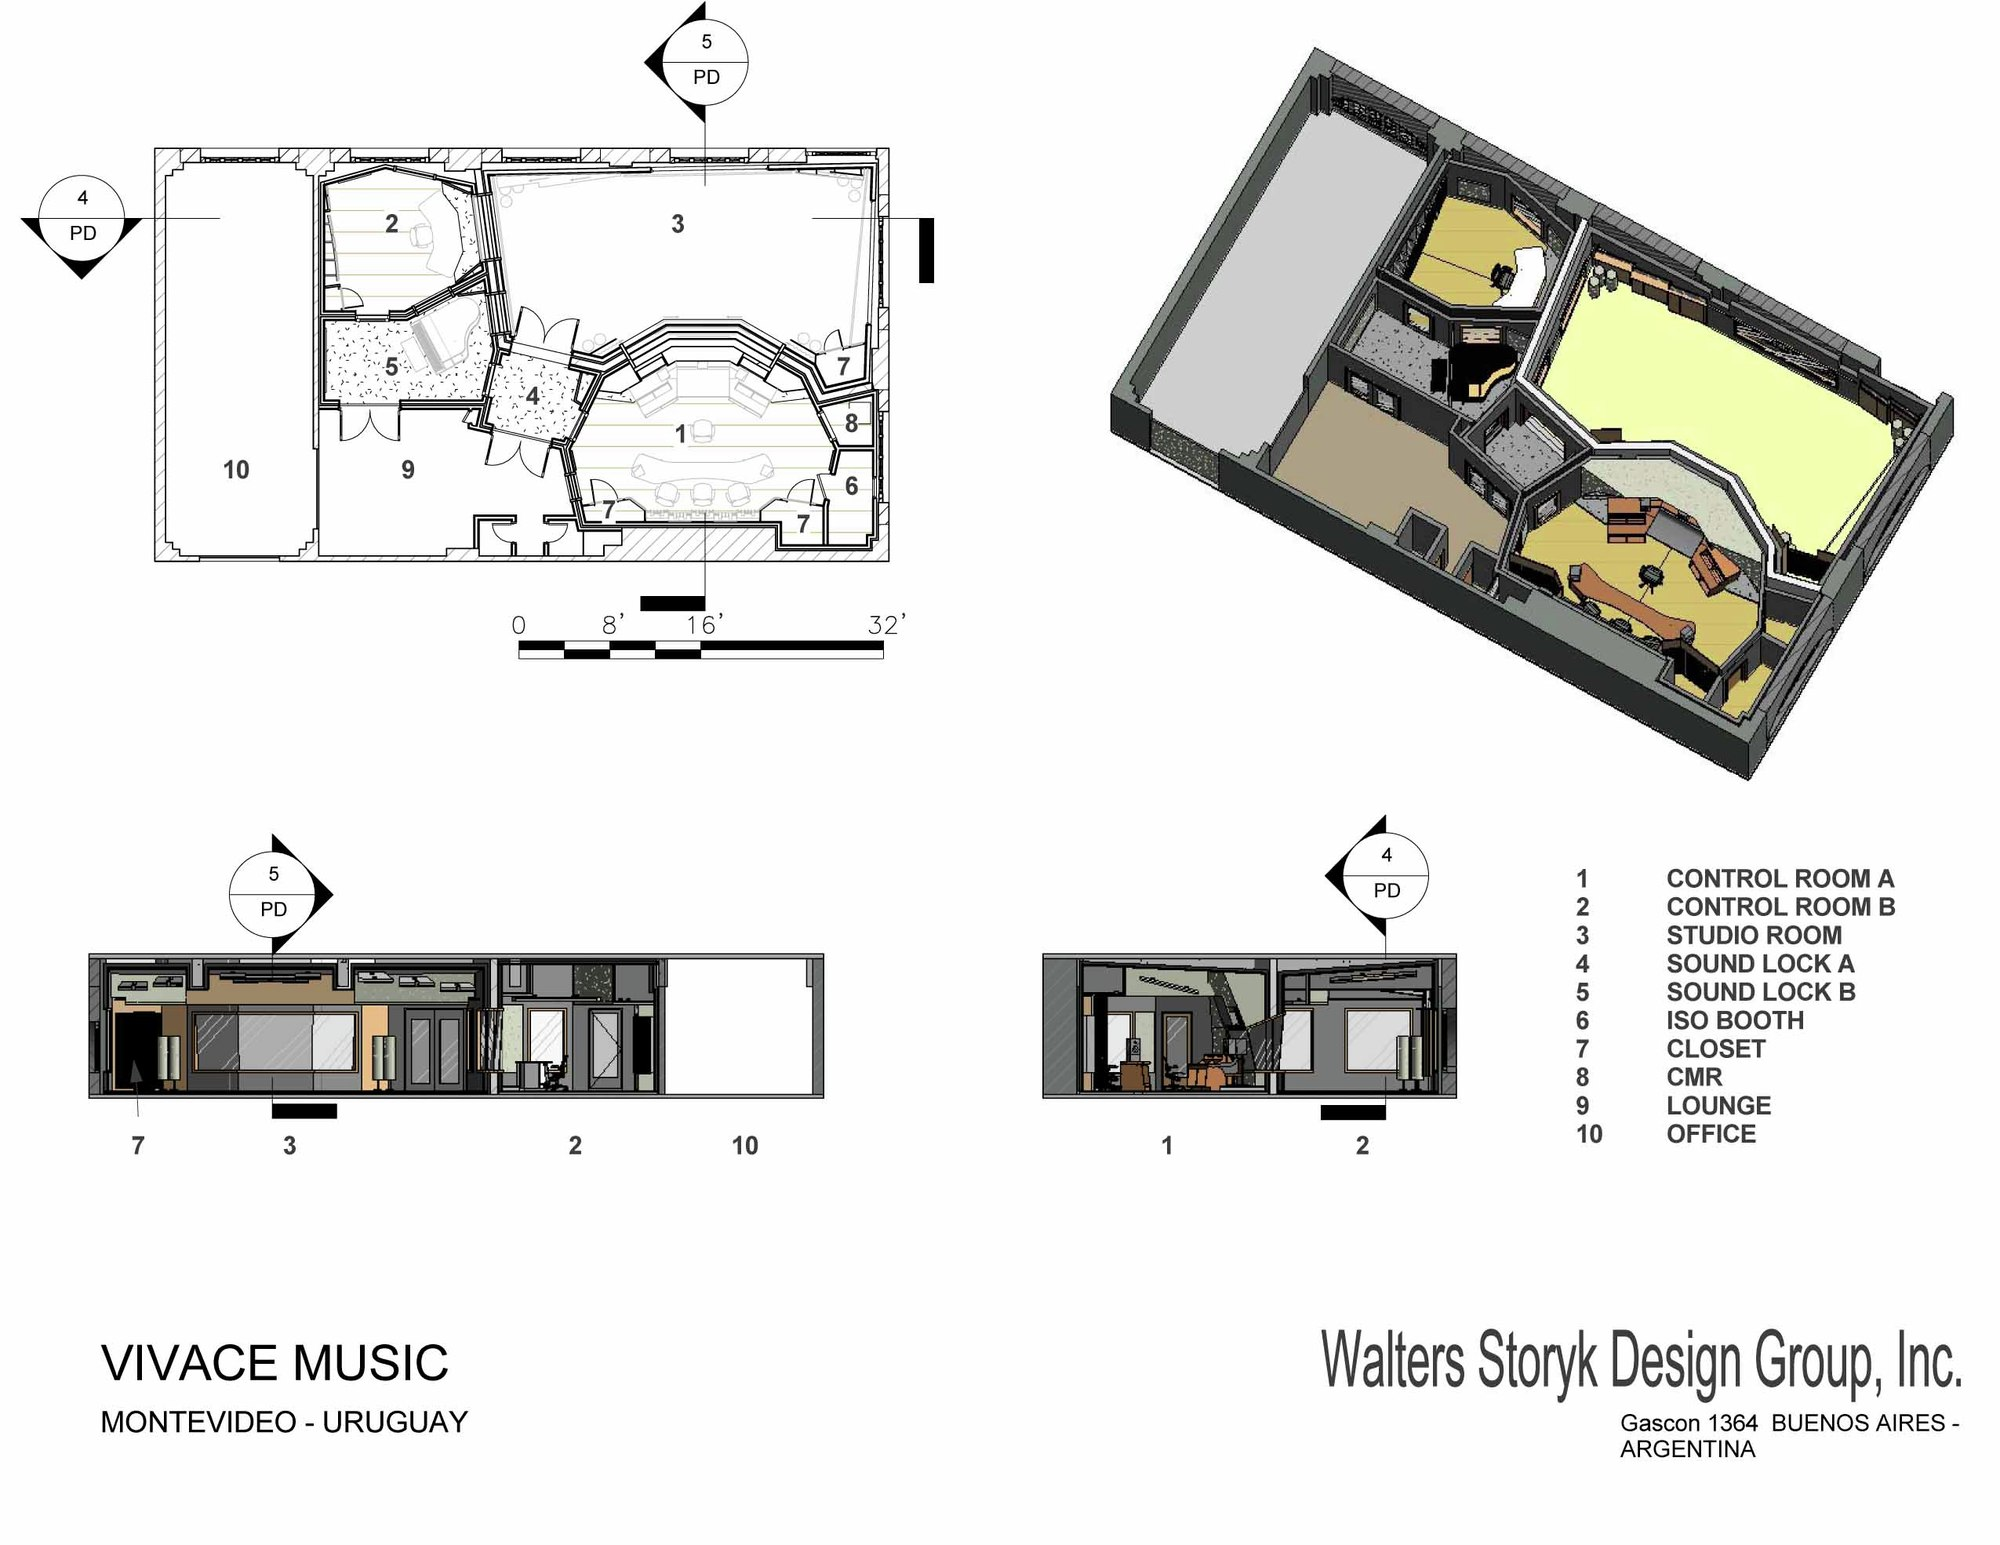 Gallery Of Vivace Music Brings World Class Wsdg Studio To Uruguay 2